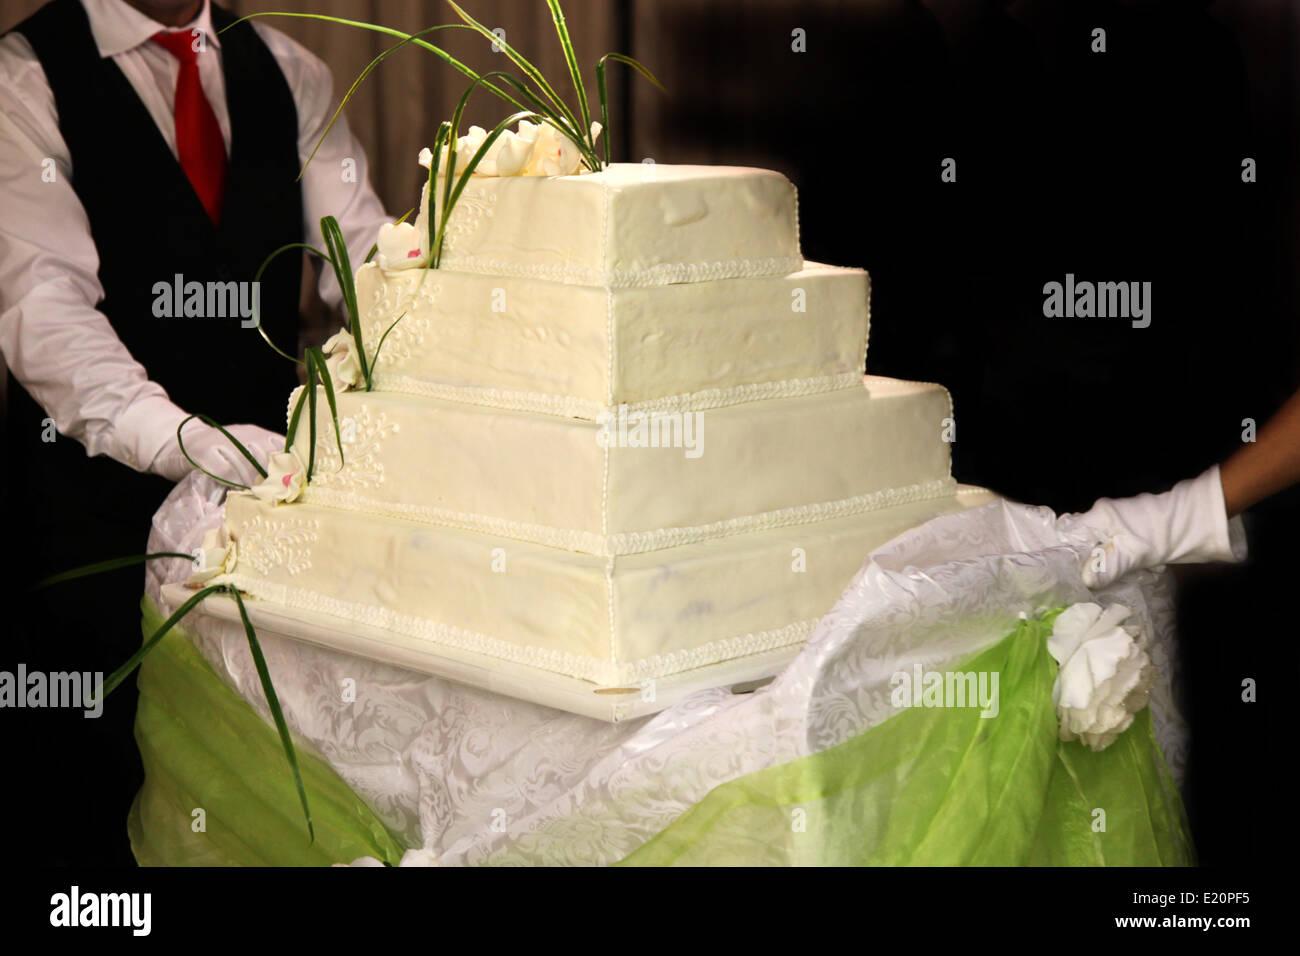 English Wedding Cake Stock Photos & English Wedding Cake Stock ...